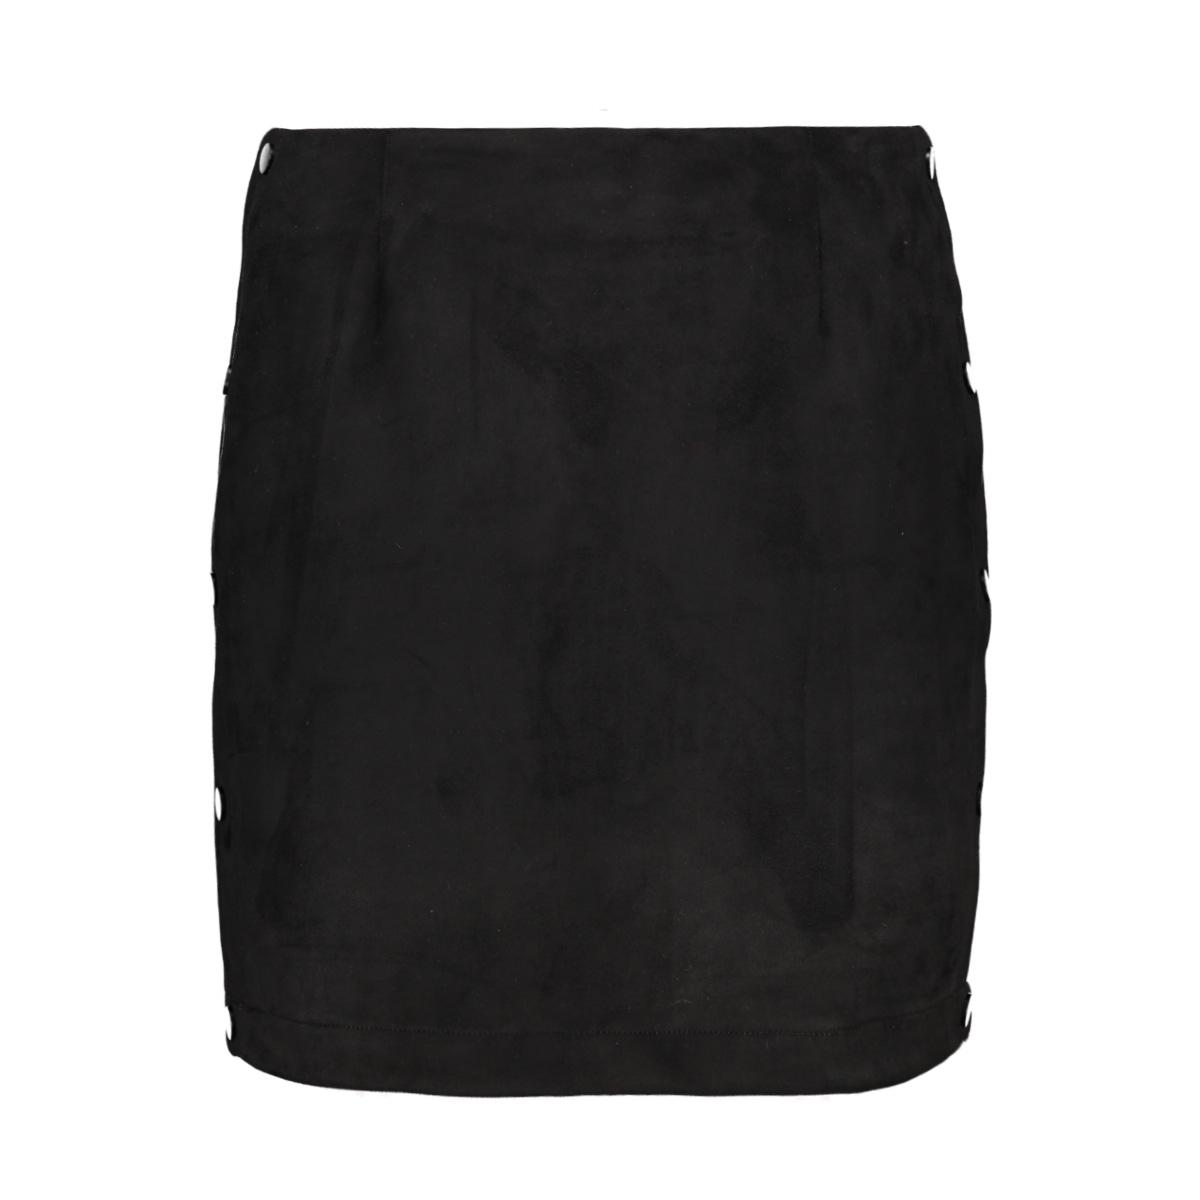 vmbelle nw short faux suede skirt 10211152 vero moda rok black